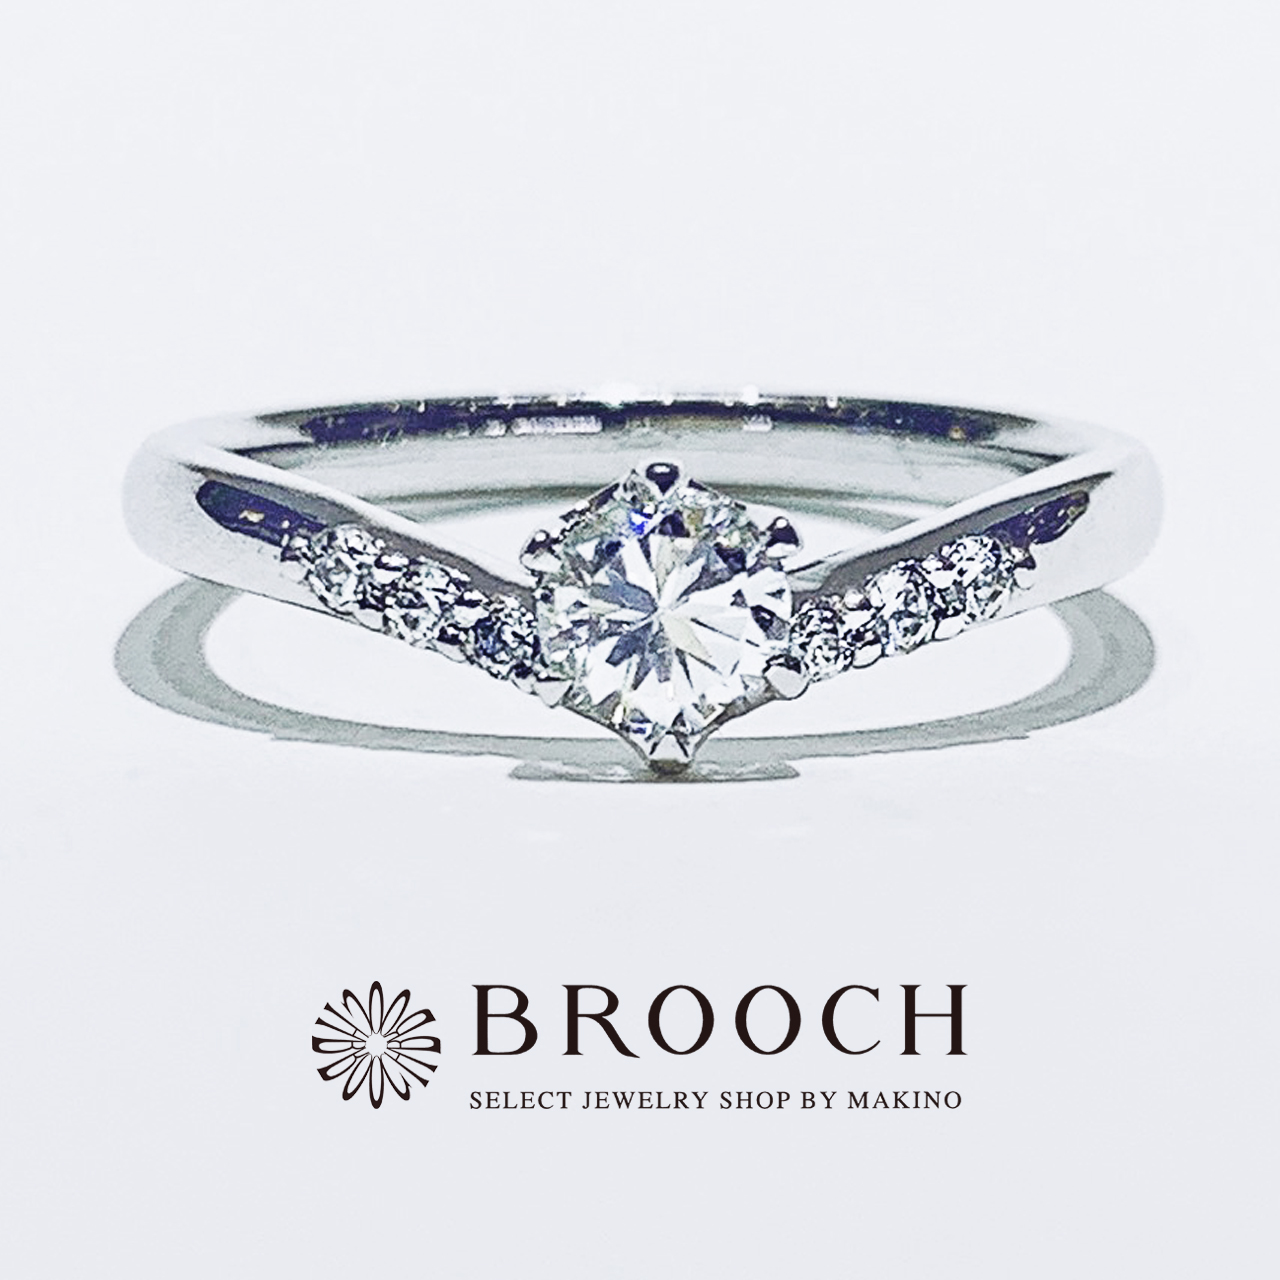 BROOCH 婚約指輪 エンゲージリング かわいい 両サイドメレV字デザイン